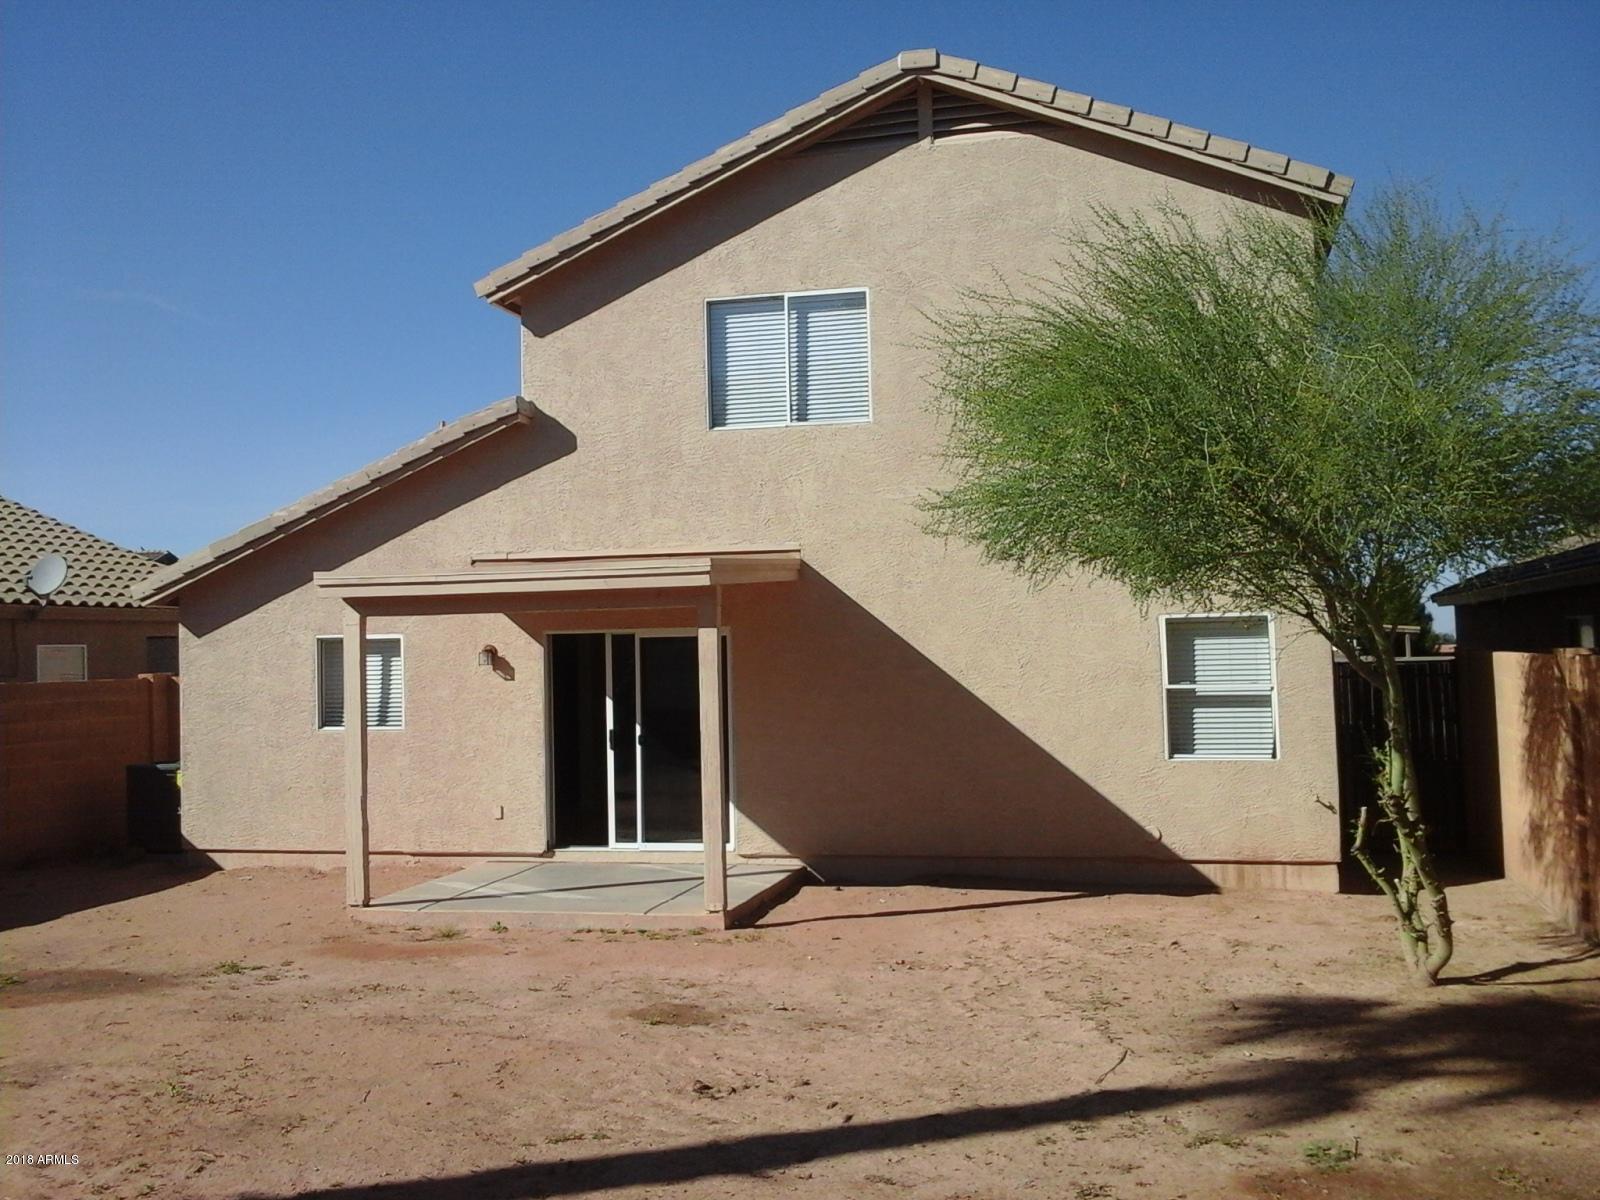 2765 E OLIVINE Road San Tan Valley, AZ 85143 - MLS #: 5853855